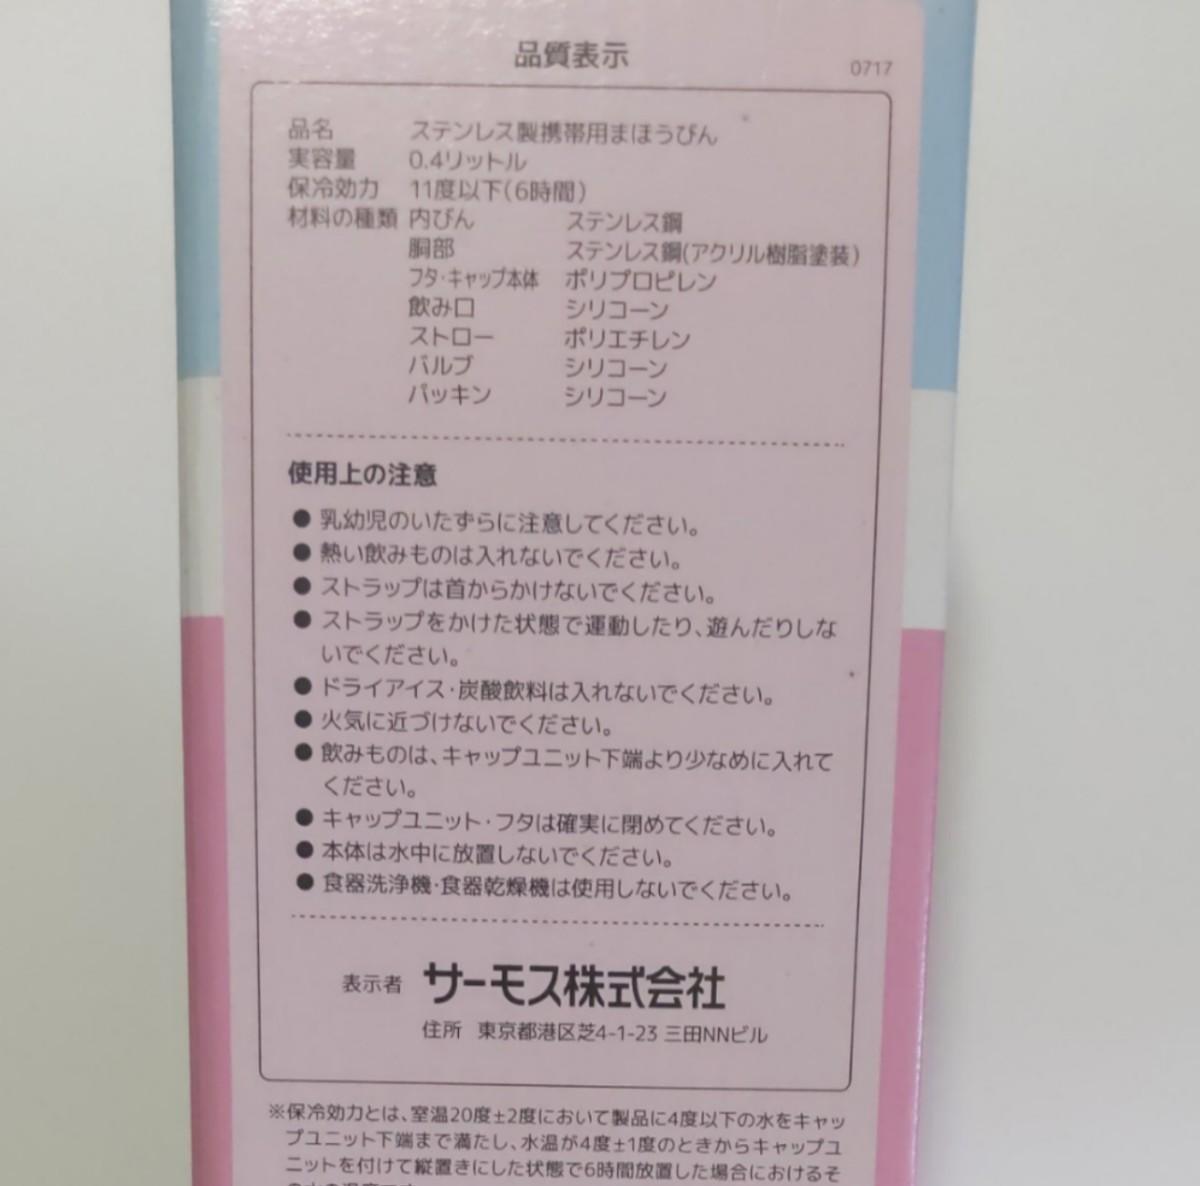 THERMOS サーモス 真空断熱 ストローボトル 水筒 0.4L ステンレスボトル